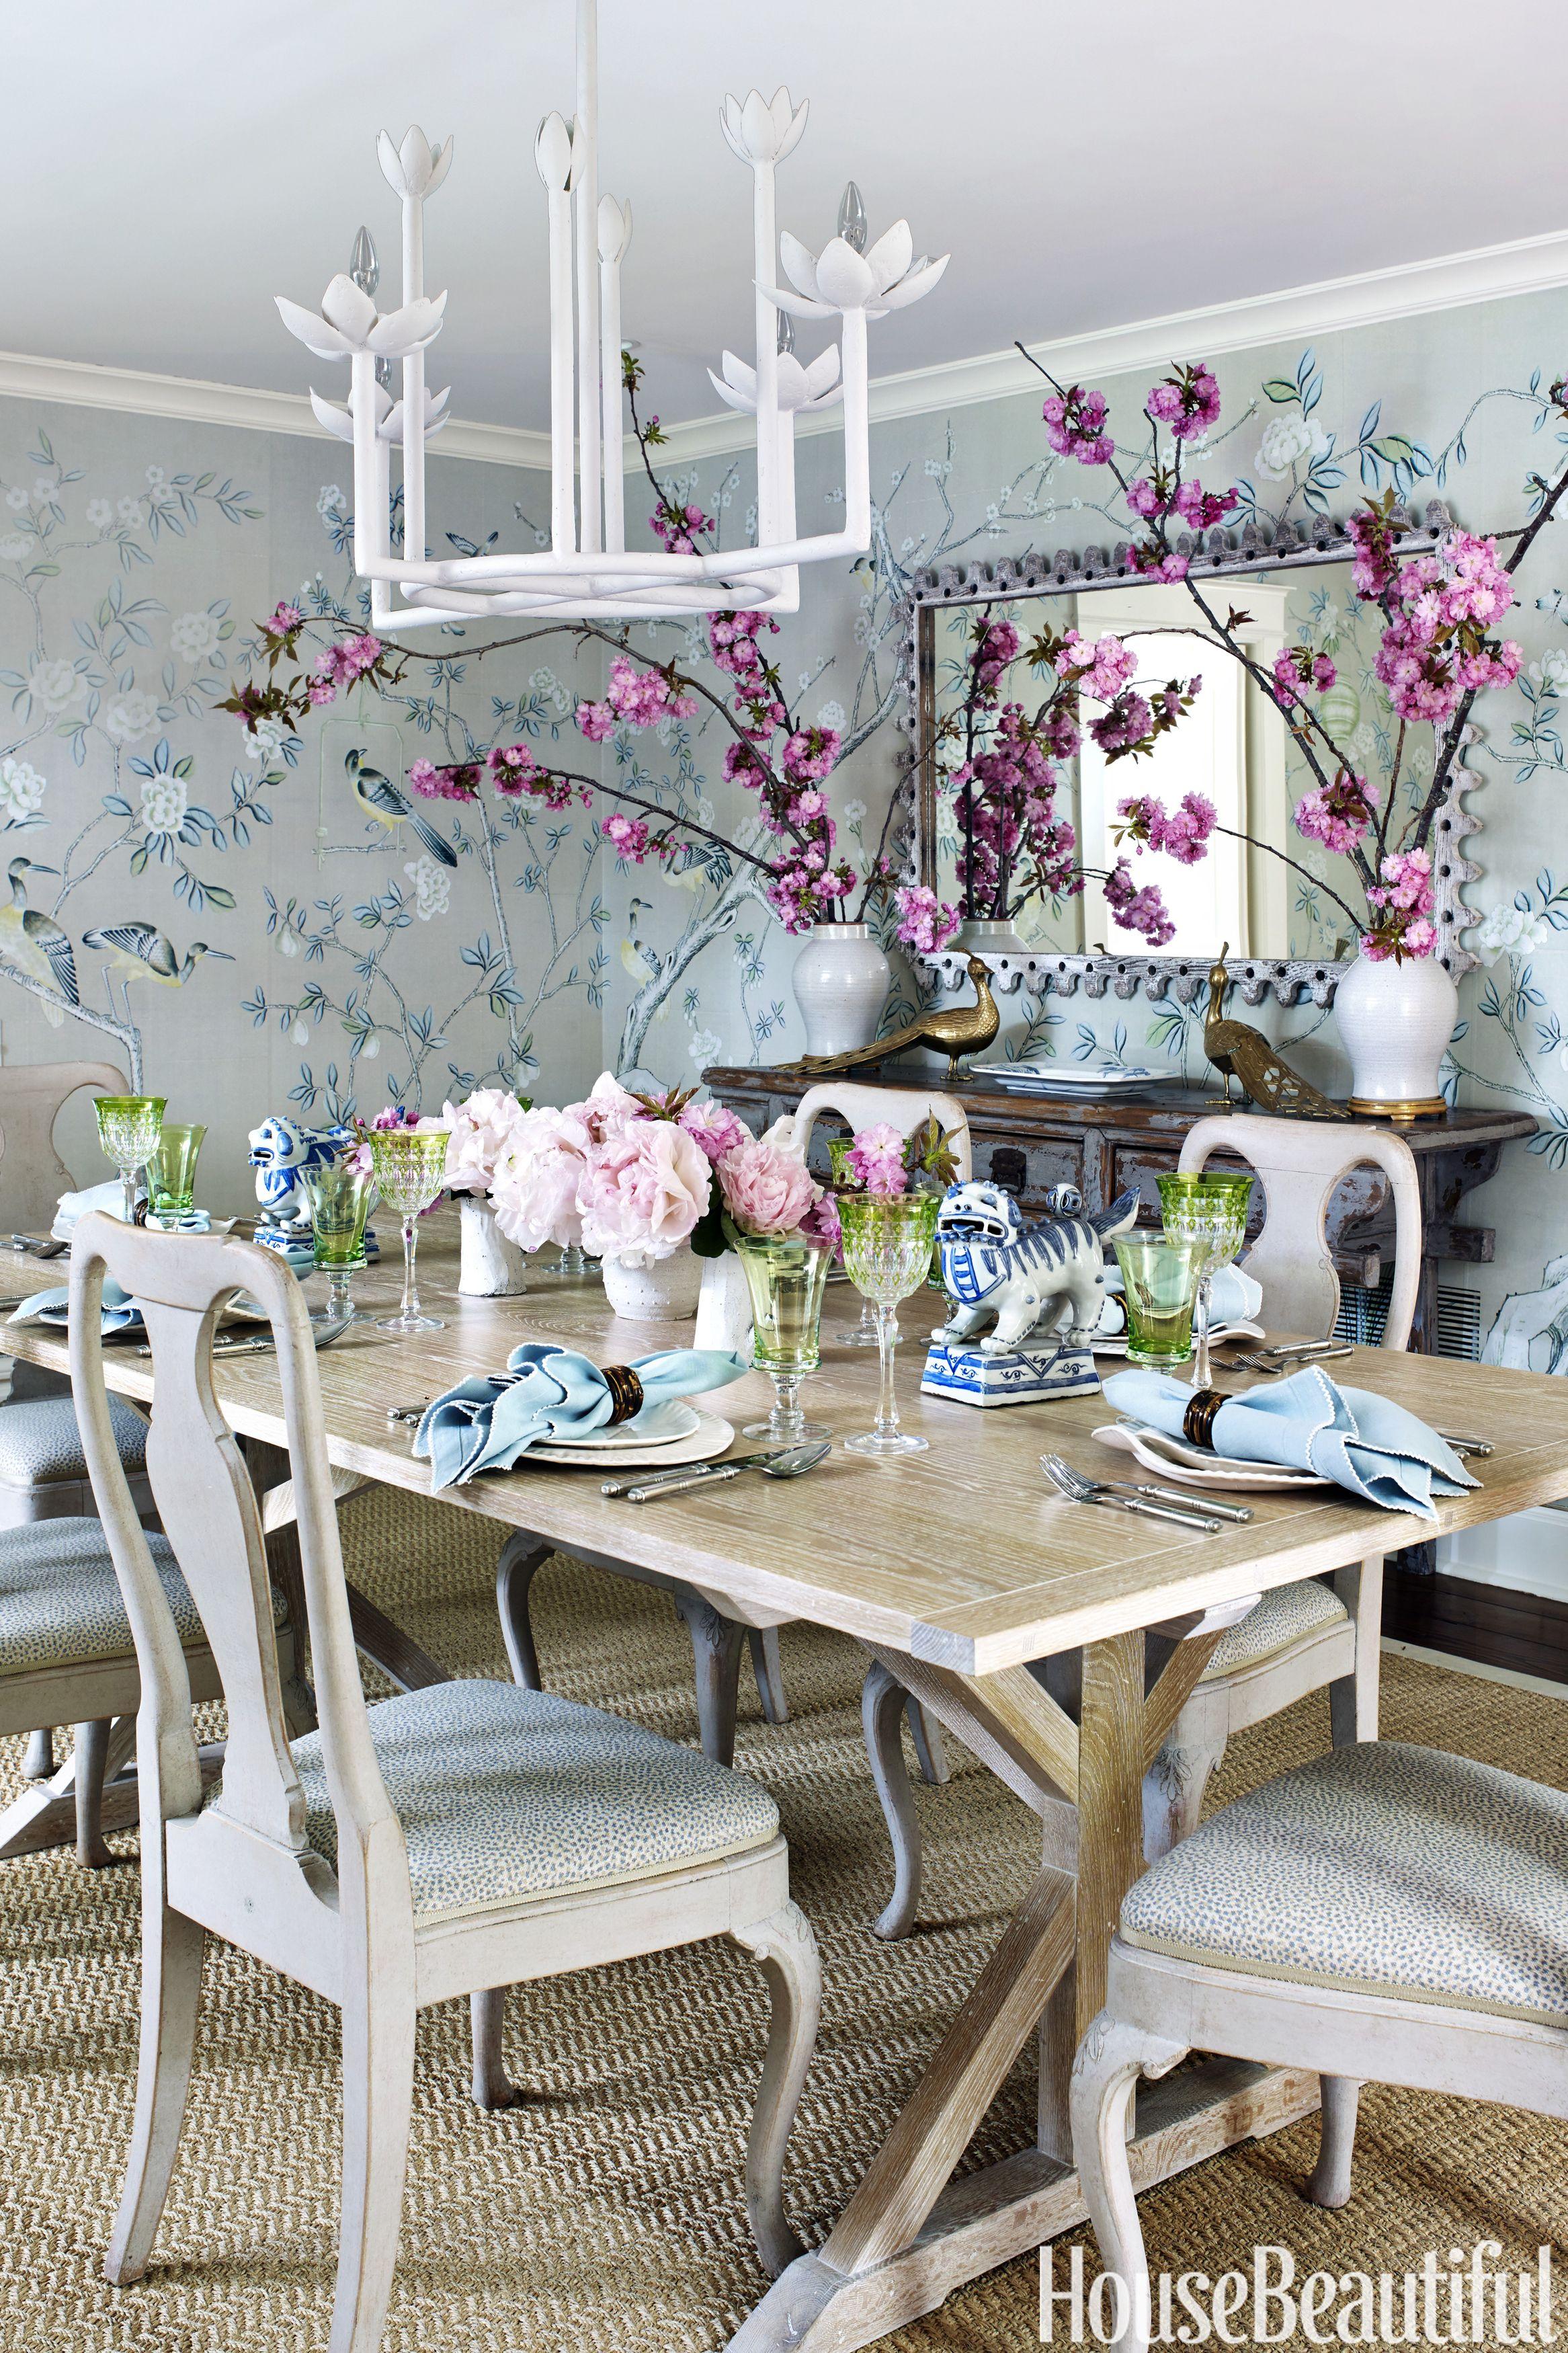 Amazing House Beautiful